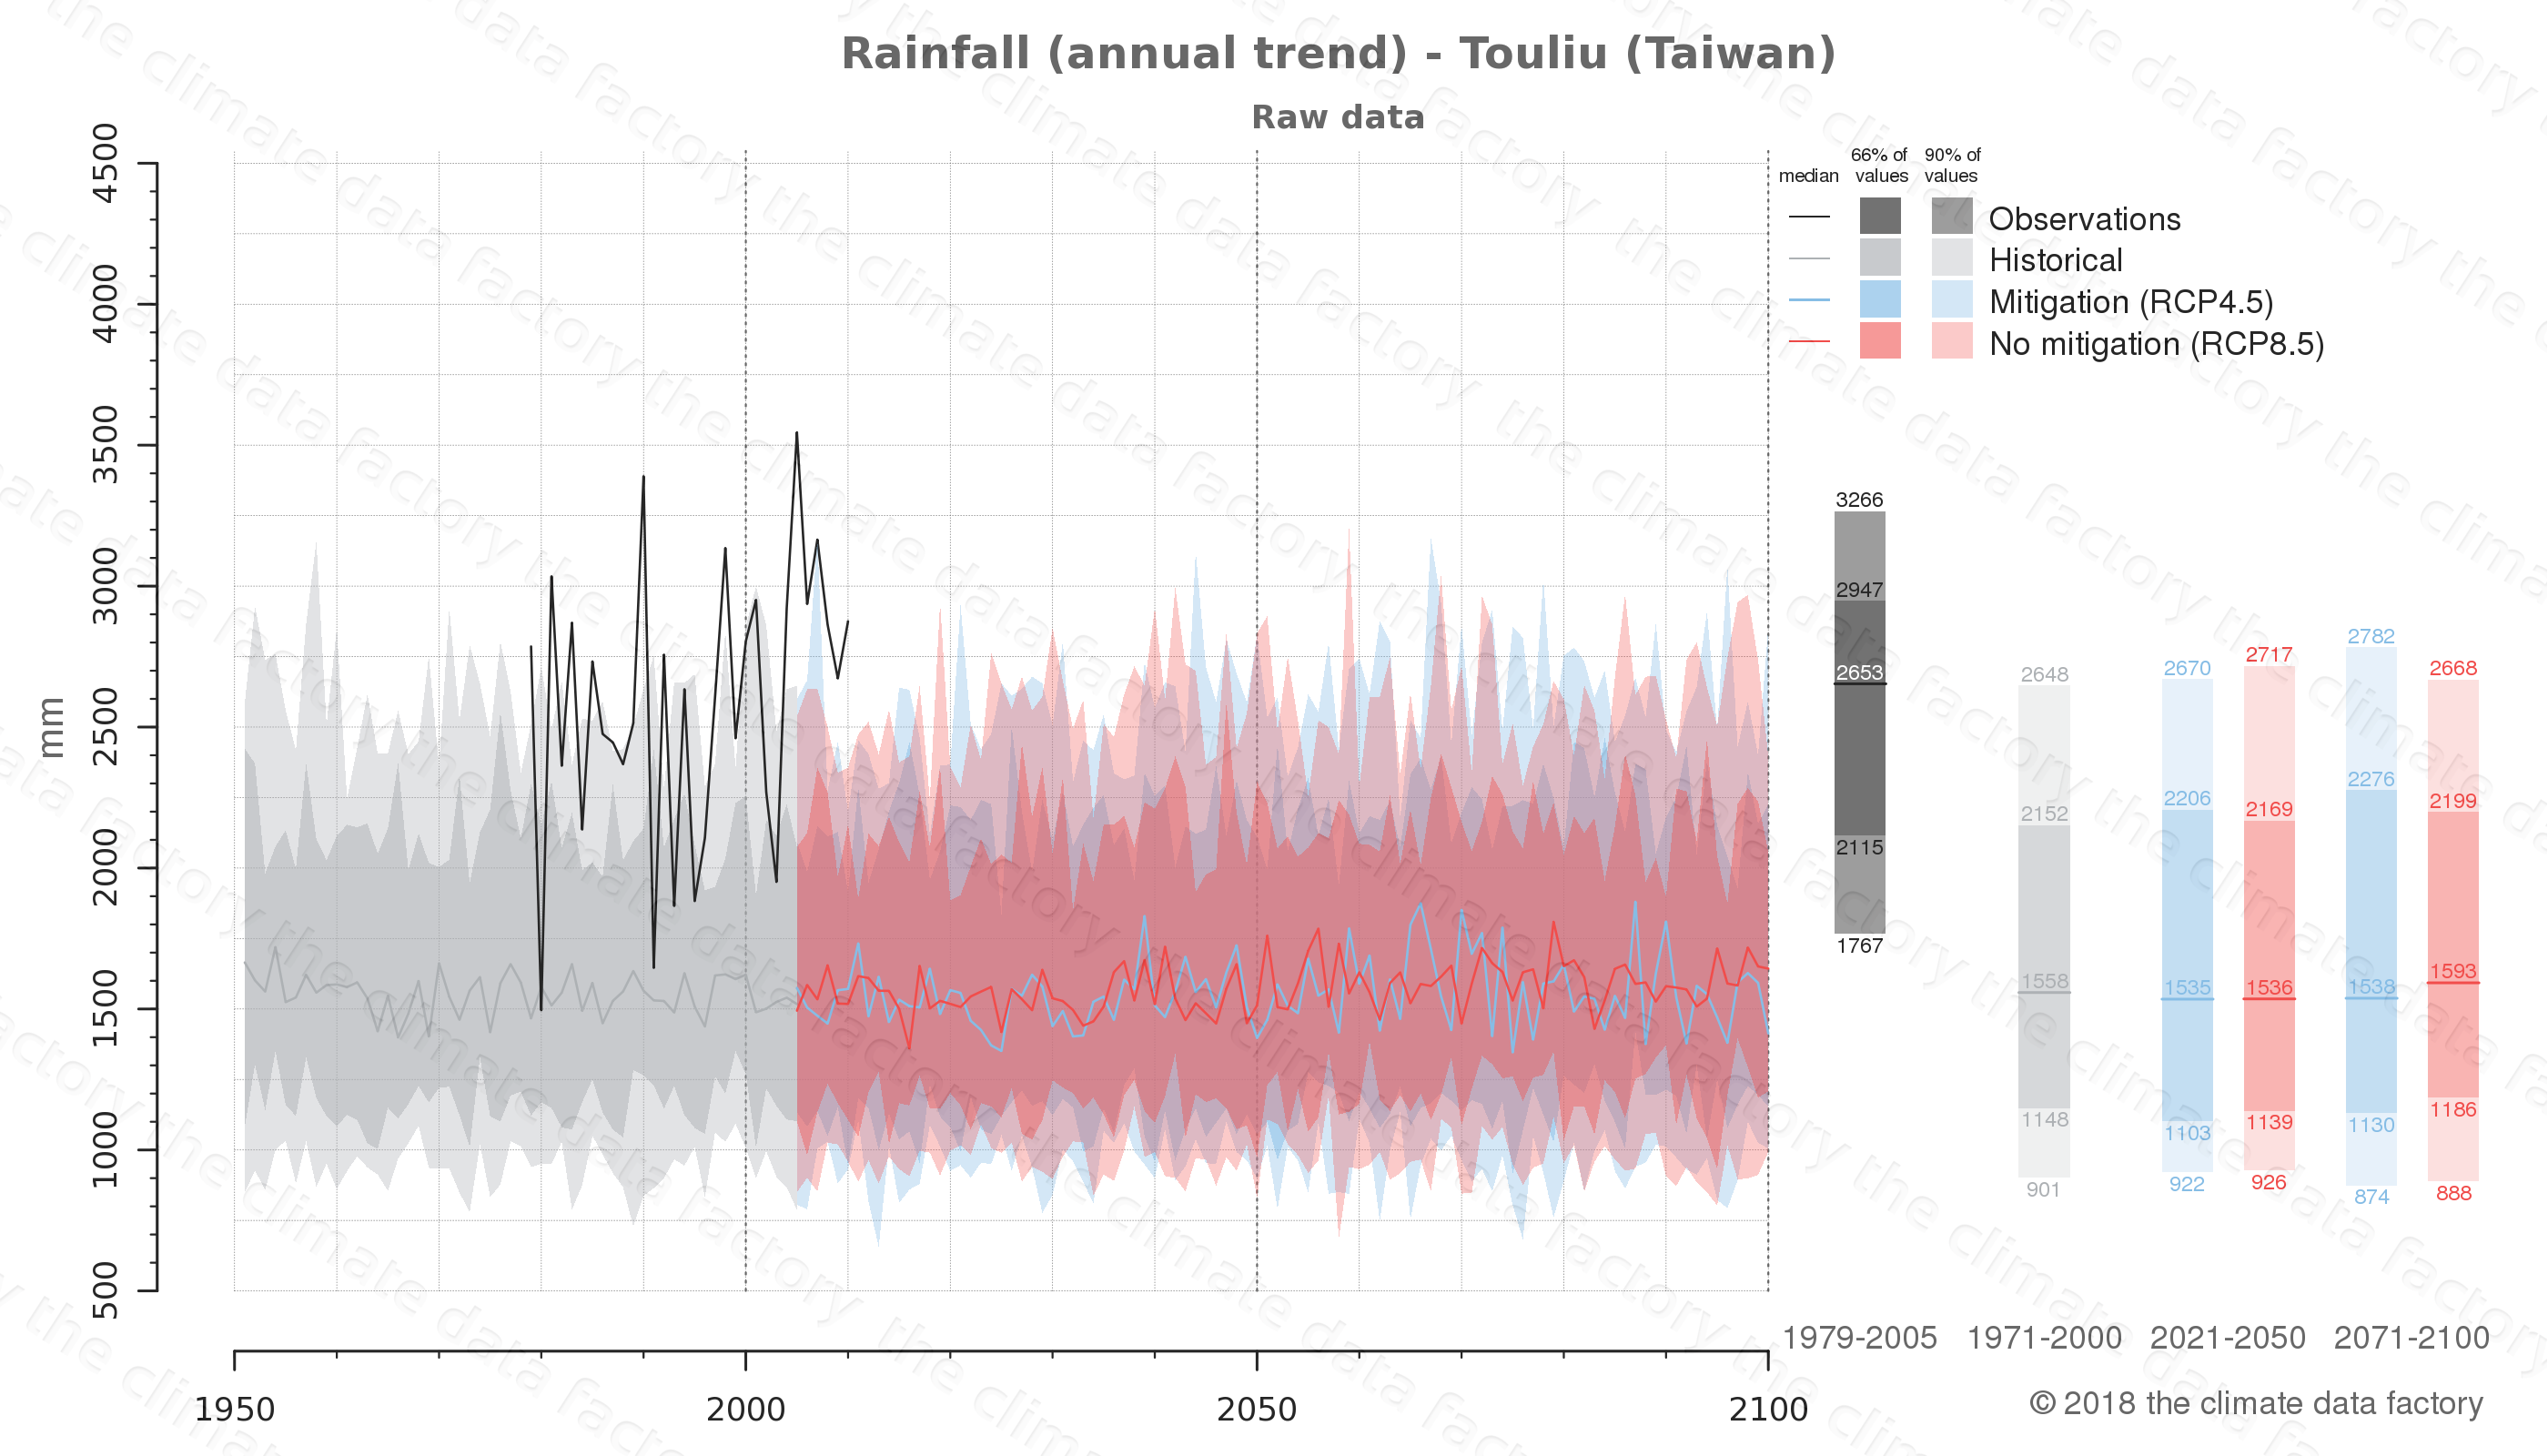 climate change data policy adaptation climate graph city data rainfall touliu taiwan